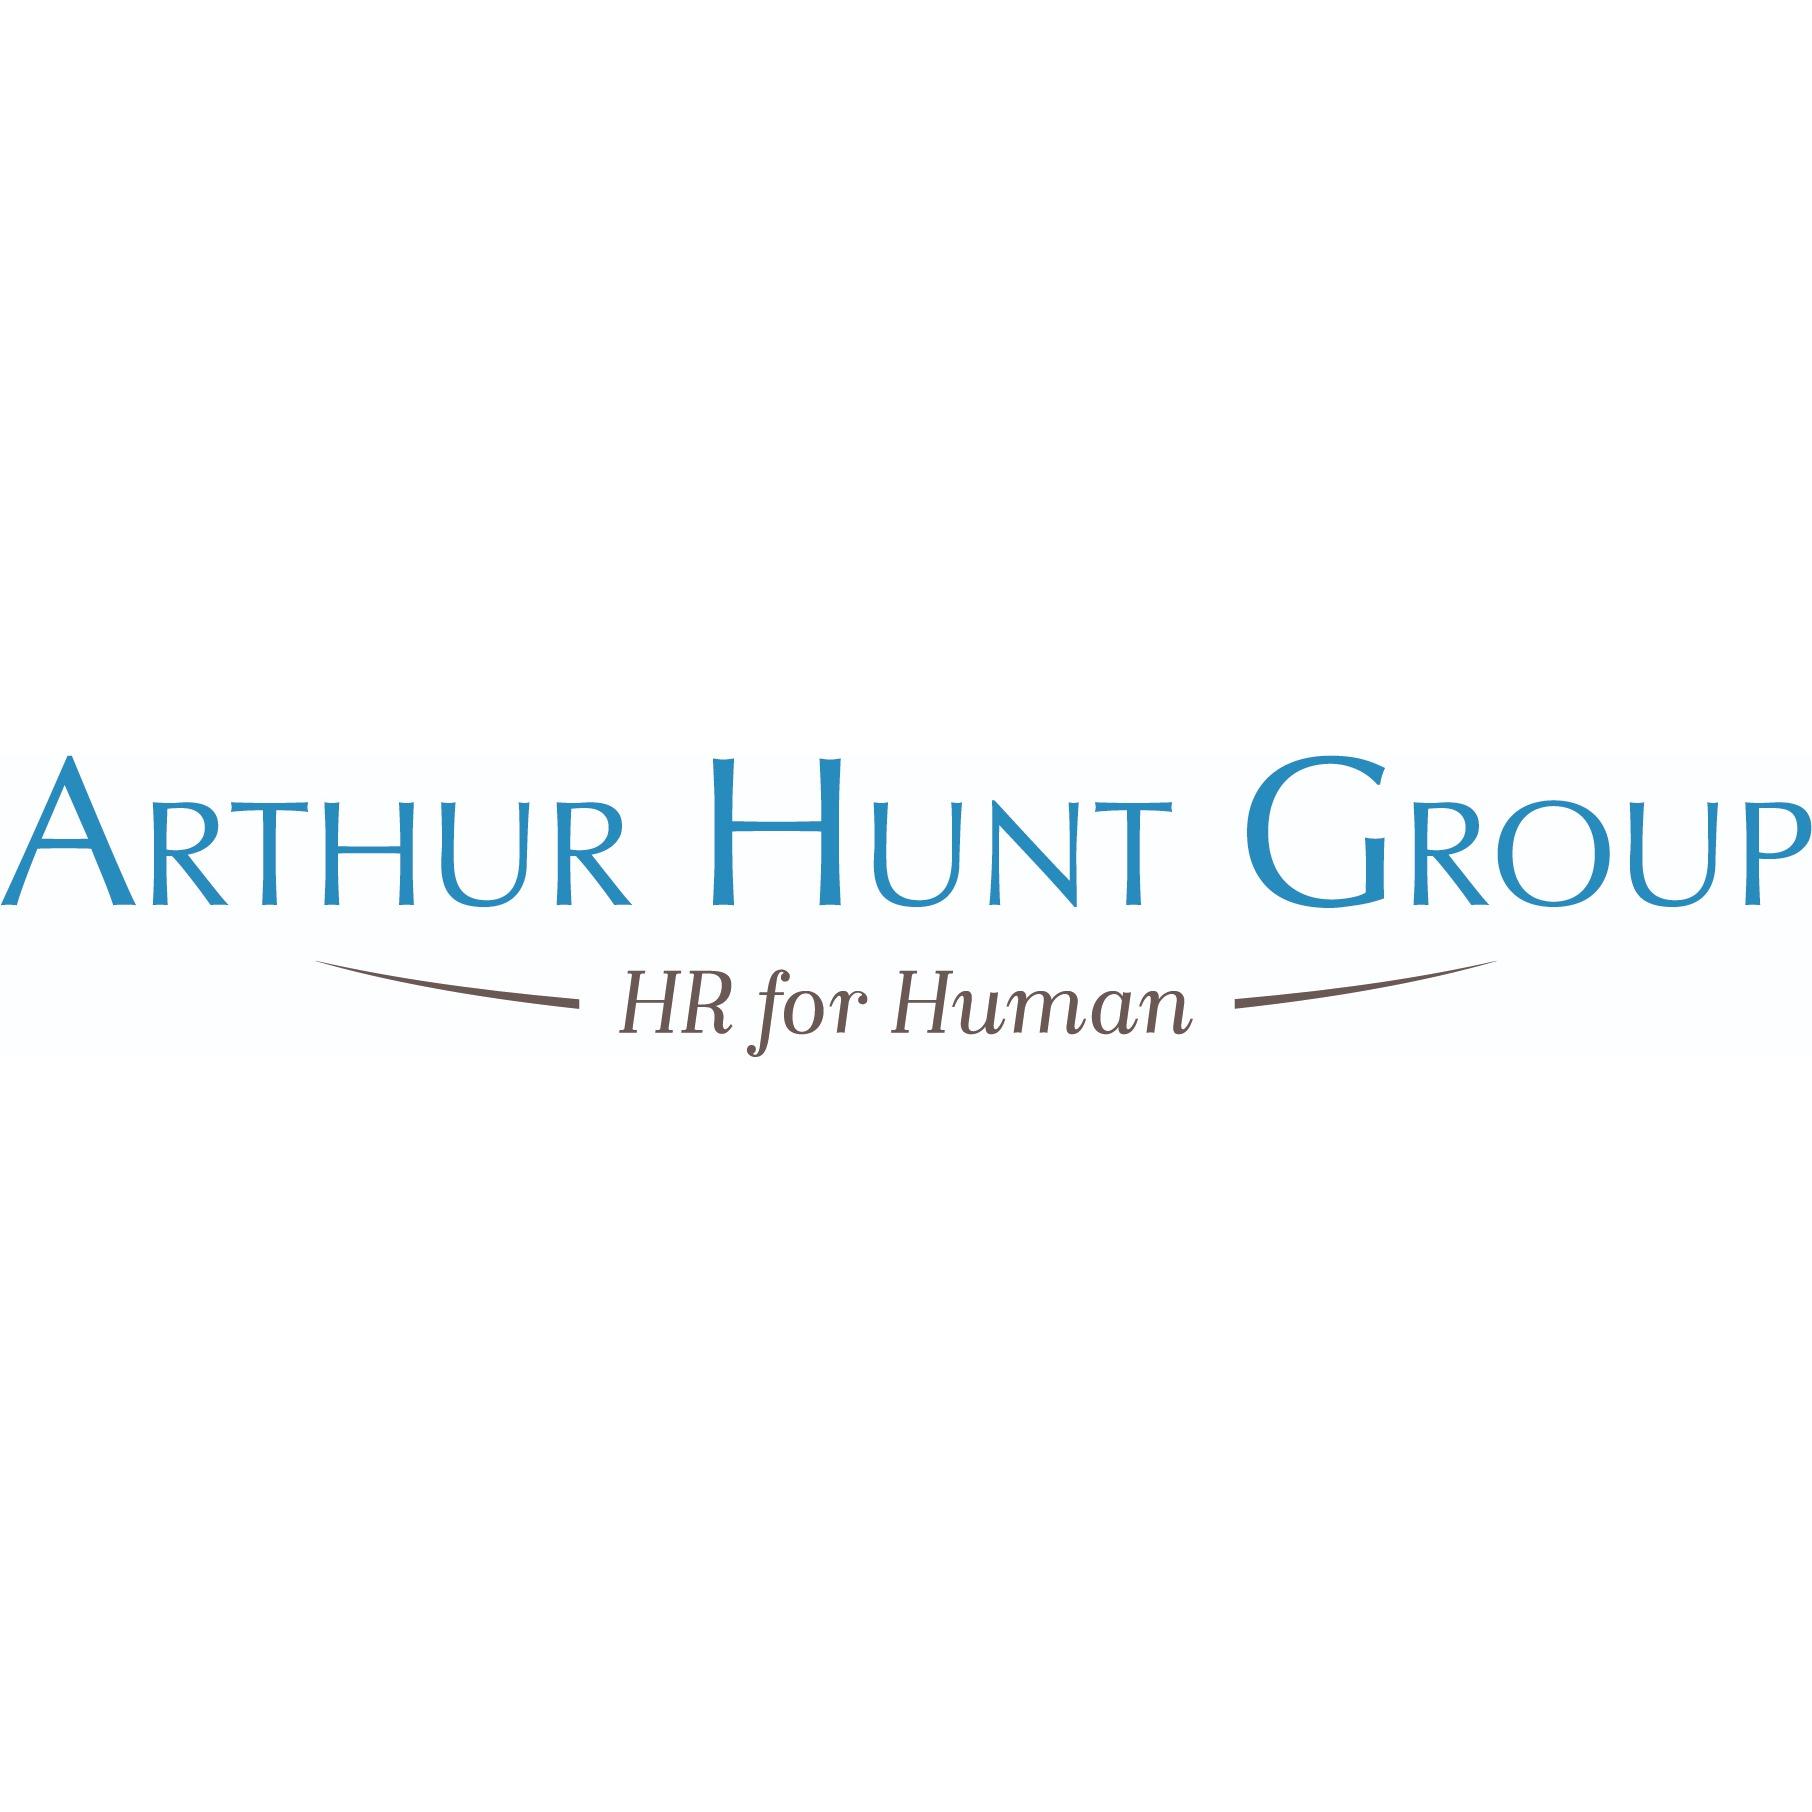 the Arthur Hunt logo.